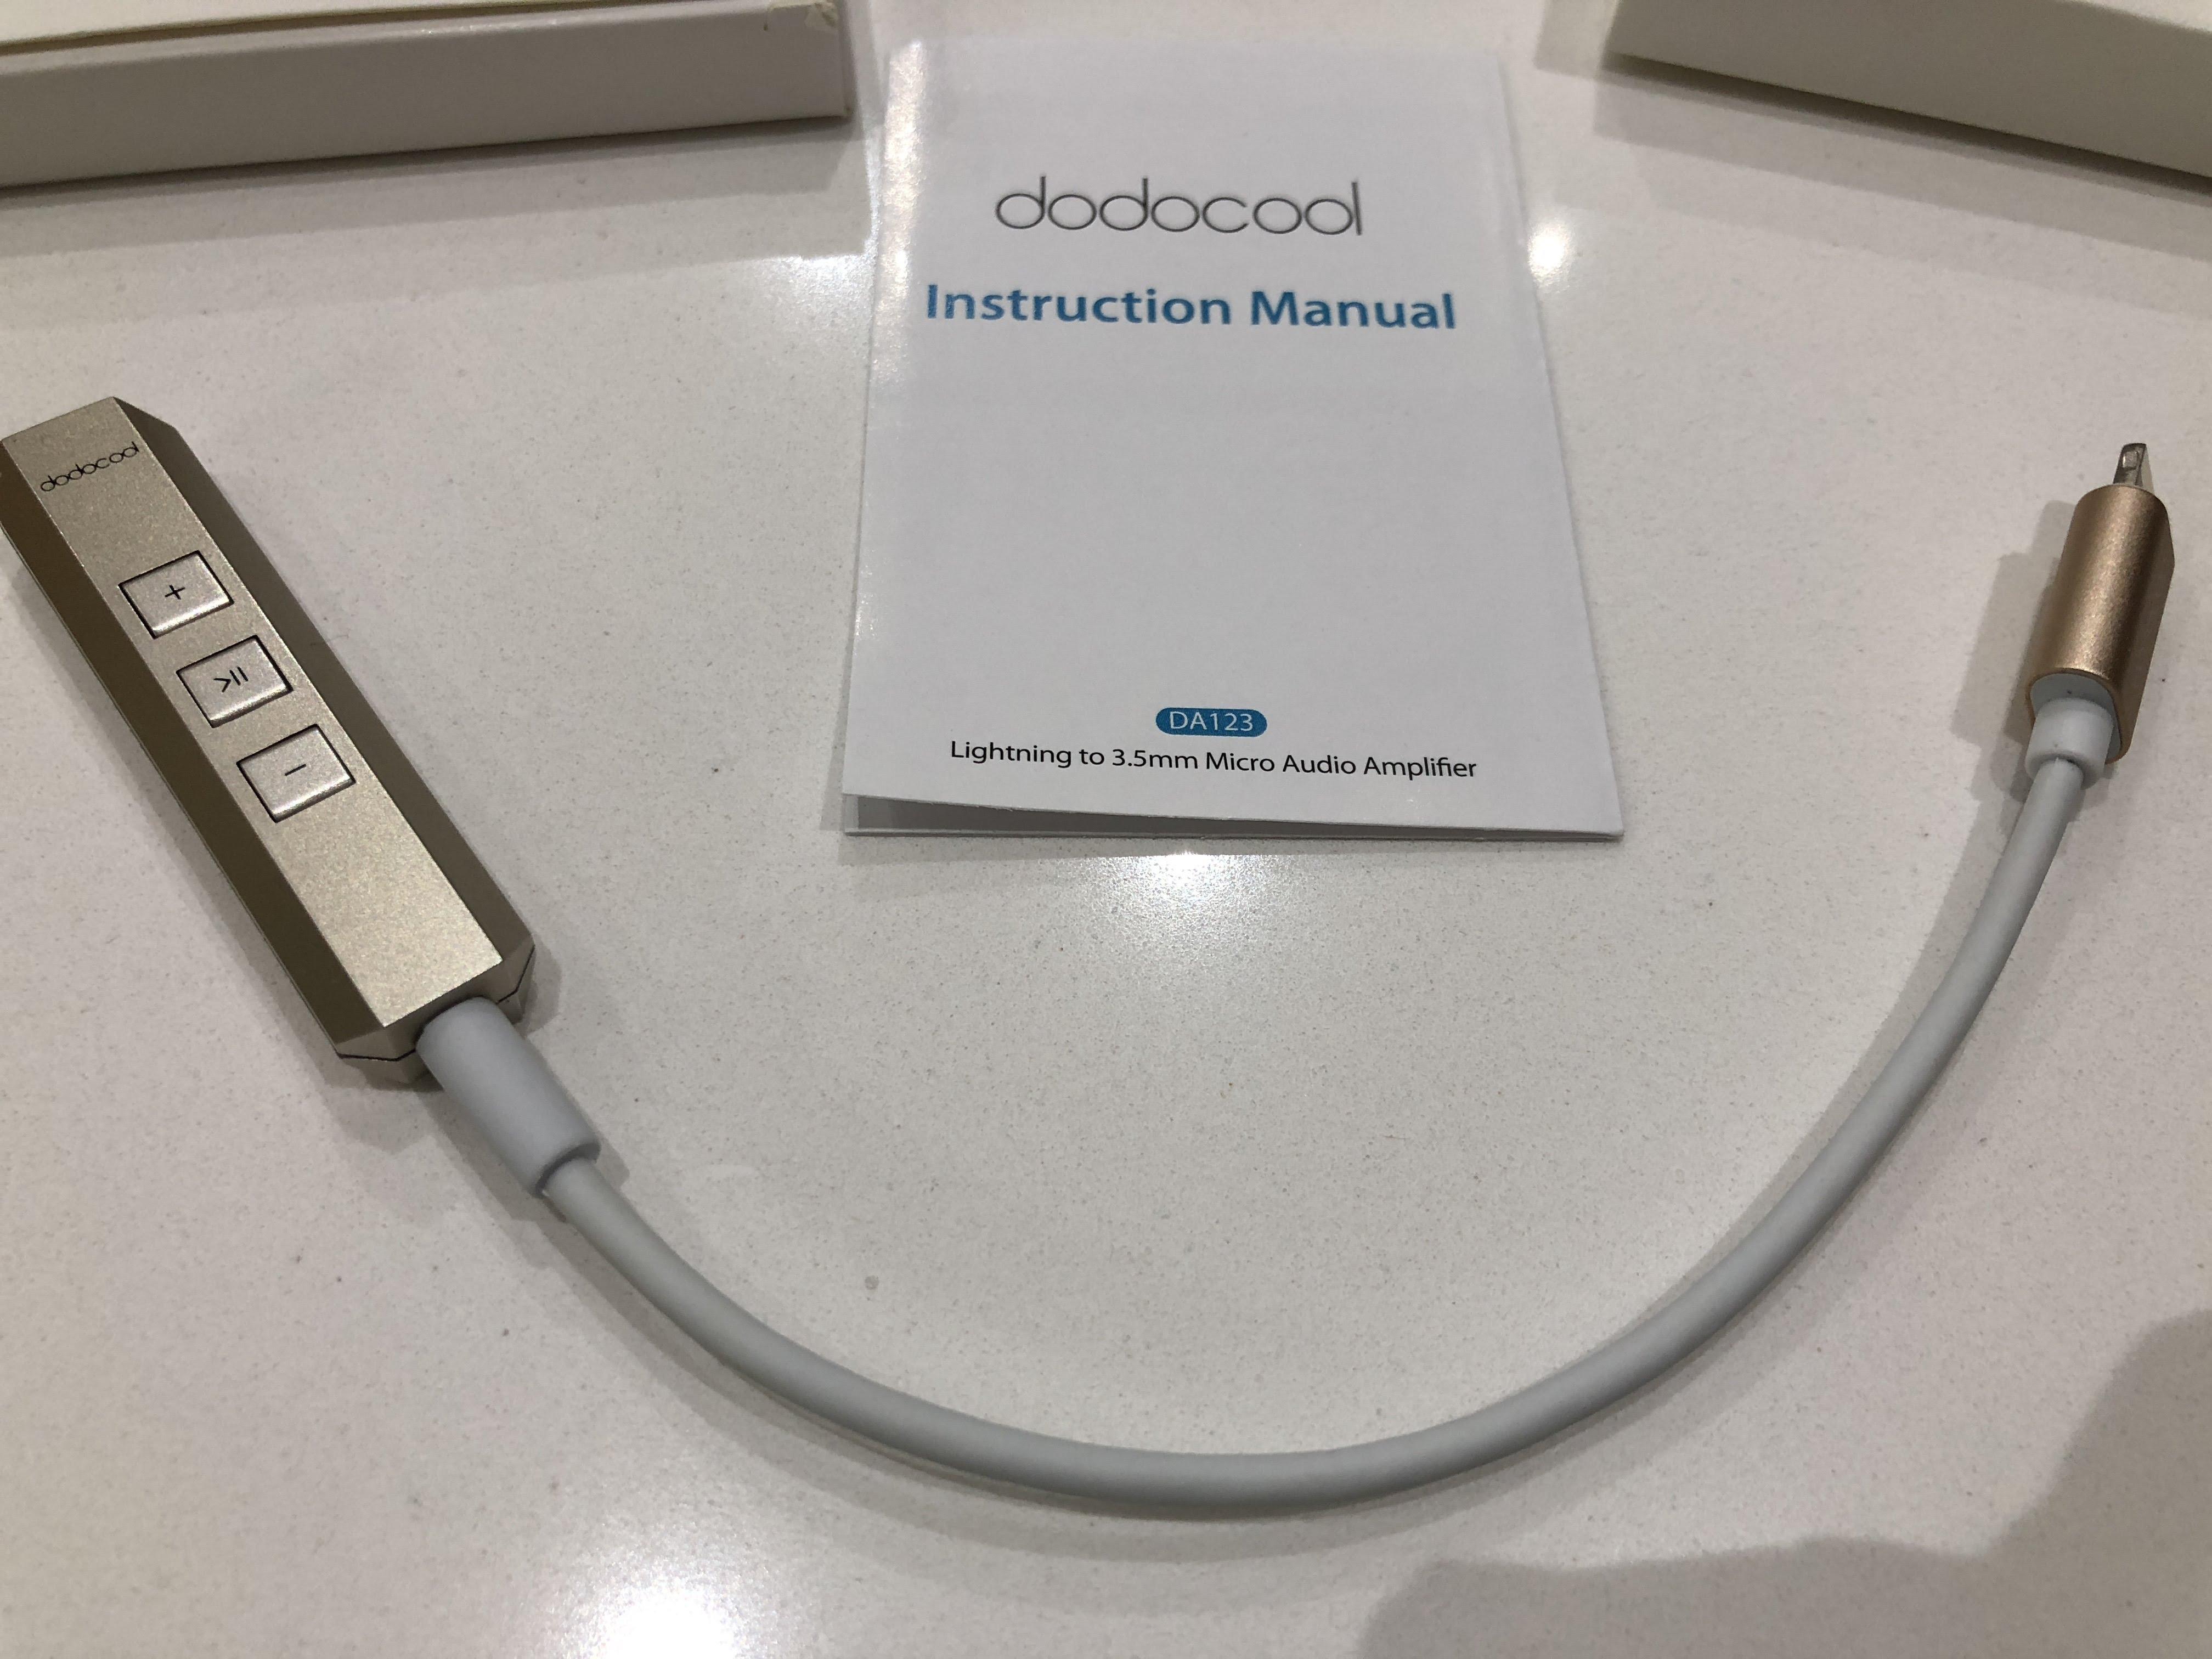 Adattatore Dodocool da Lightning a Jack Audio 3.5mm d06ede96d731